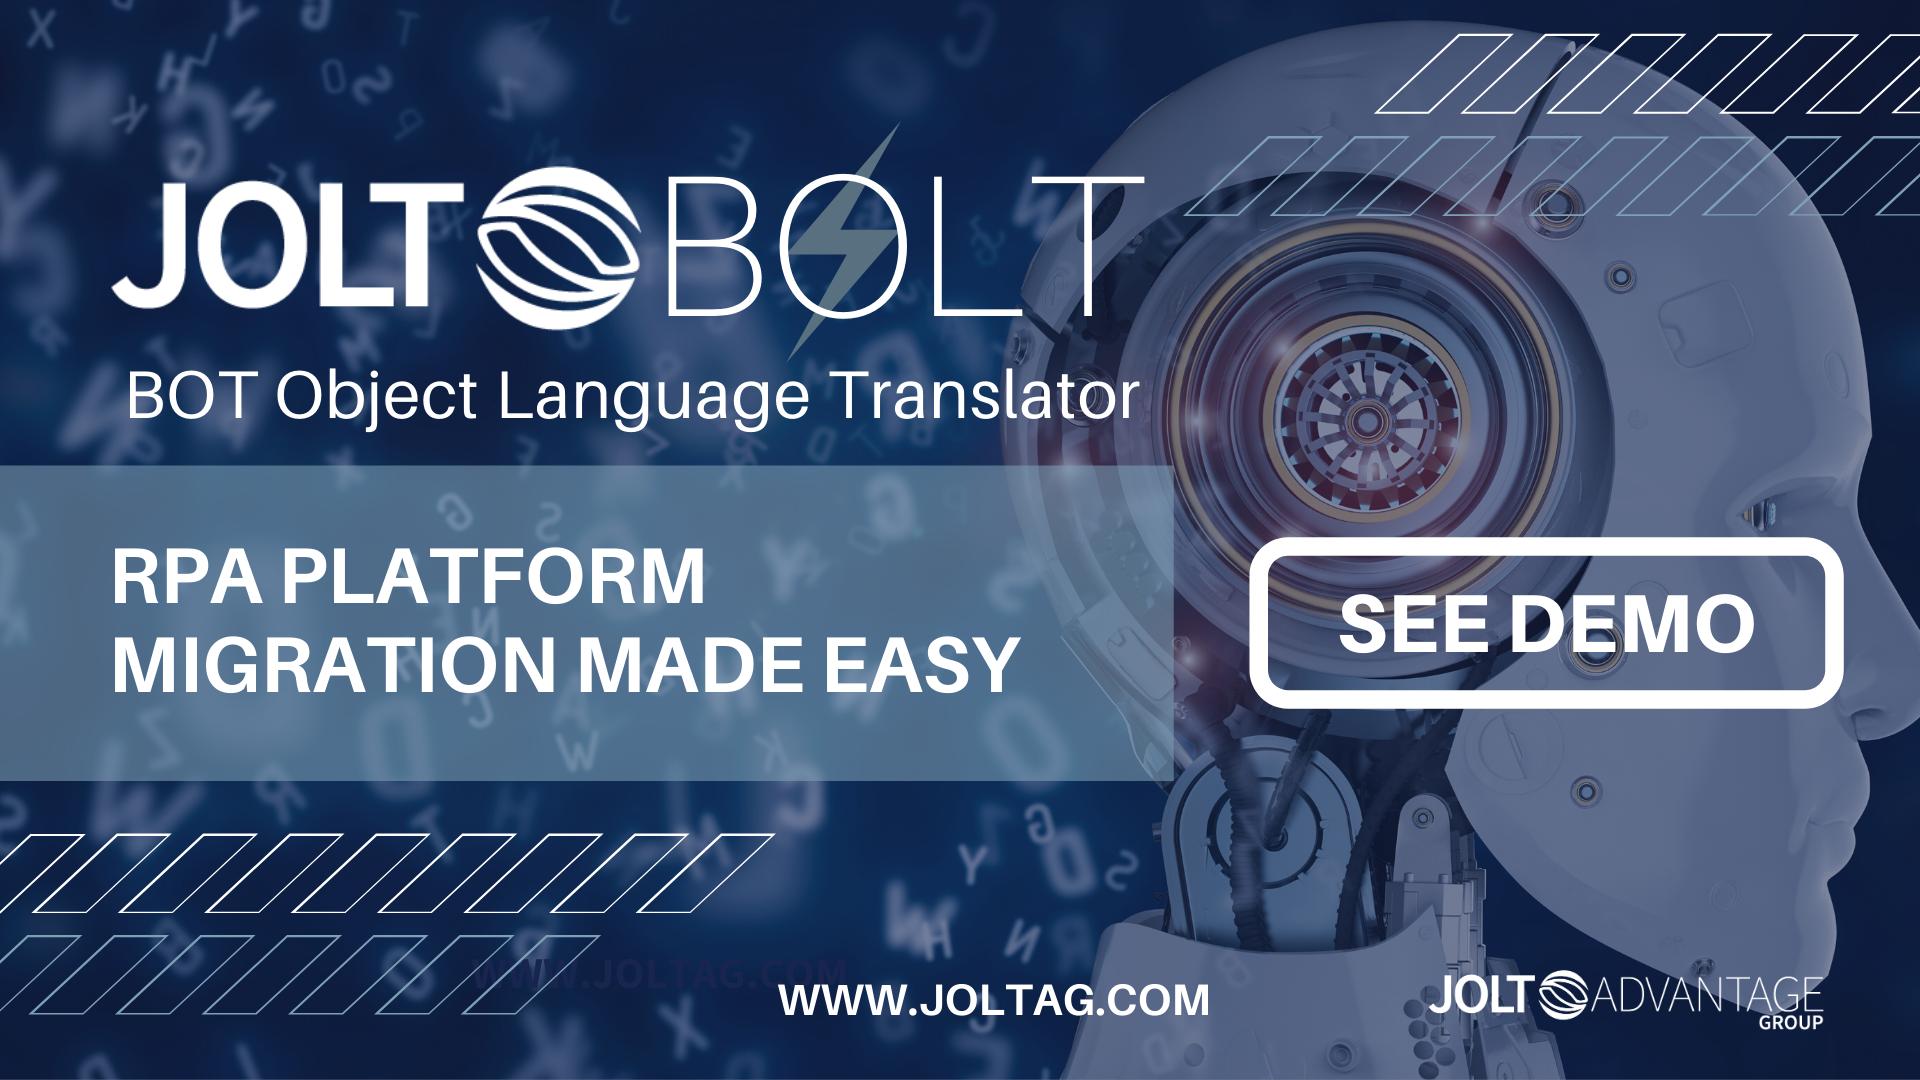 JOLT BOLT AD - RECTANGULAR